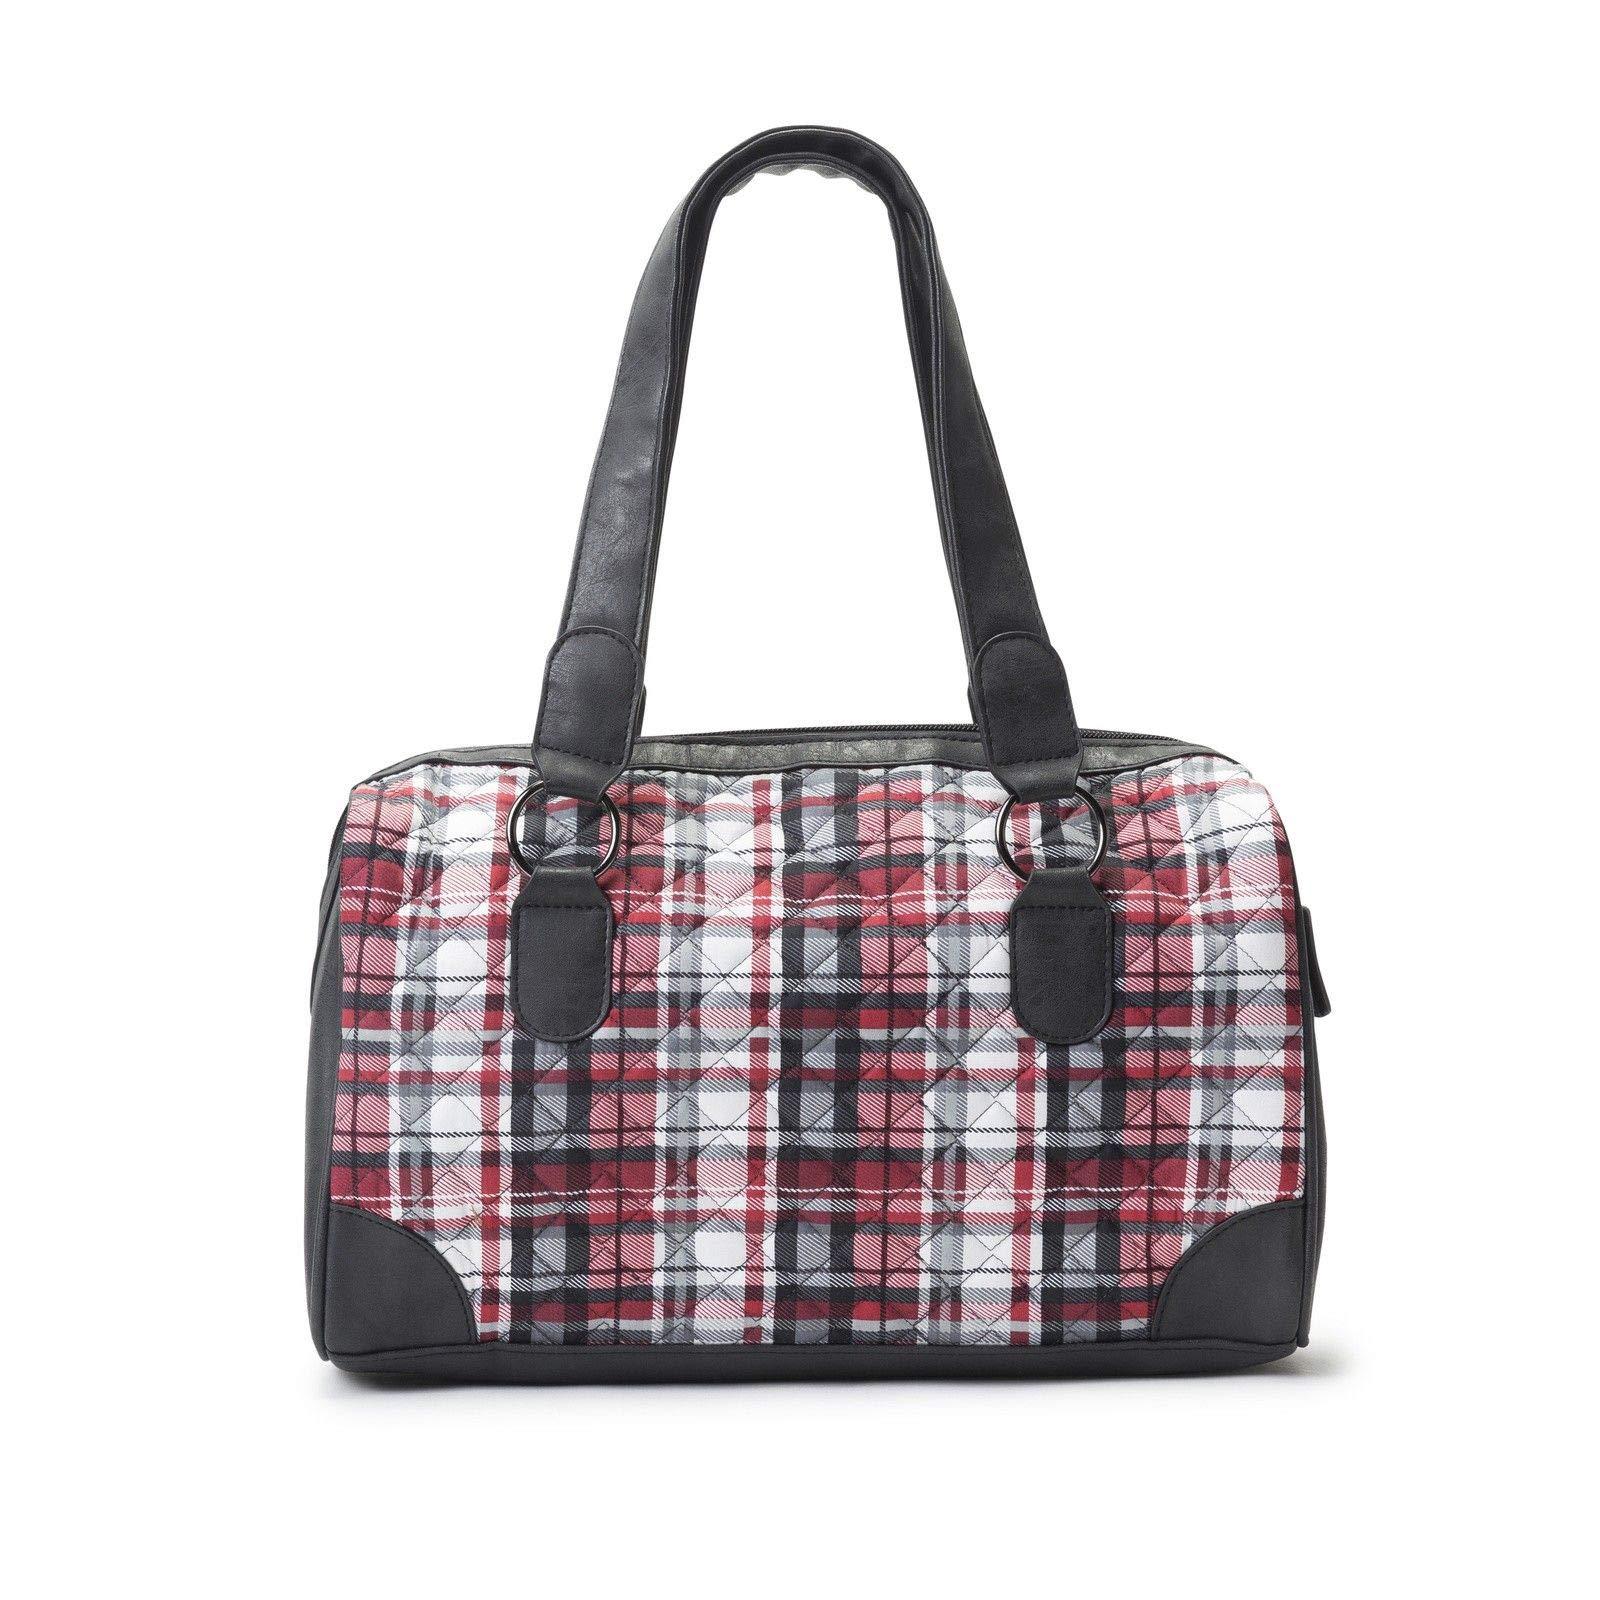 Donna Sharp Tess Medium Size Handbag